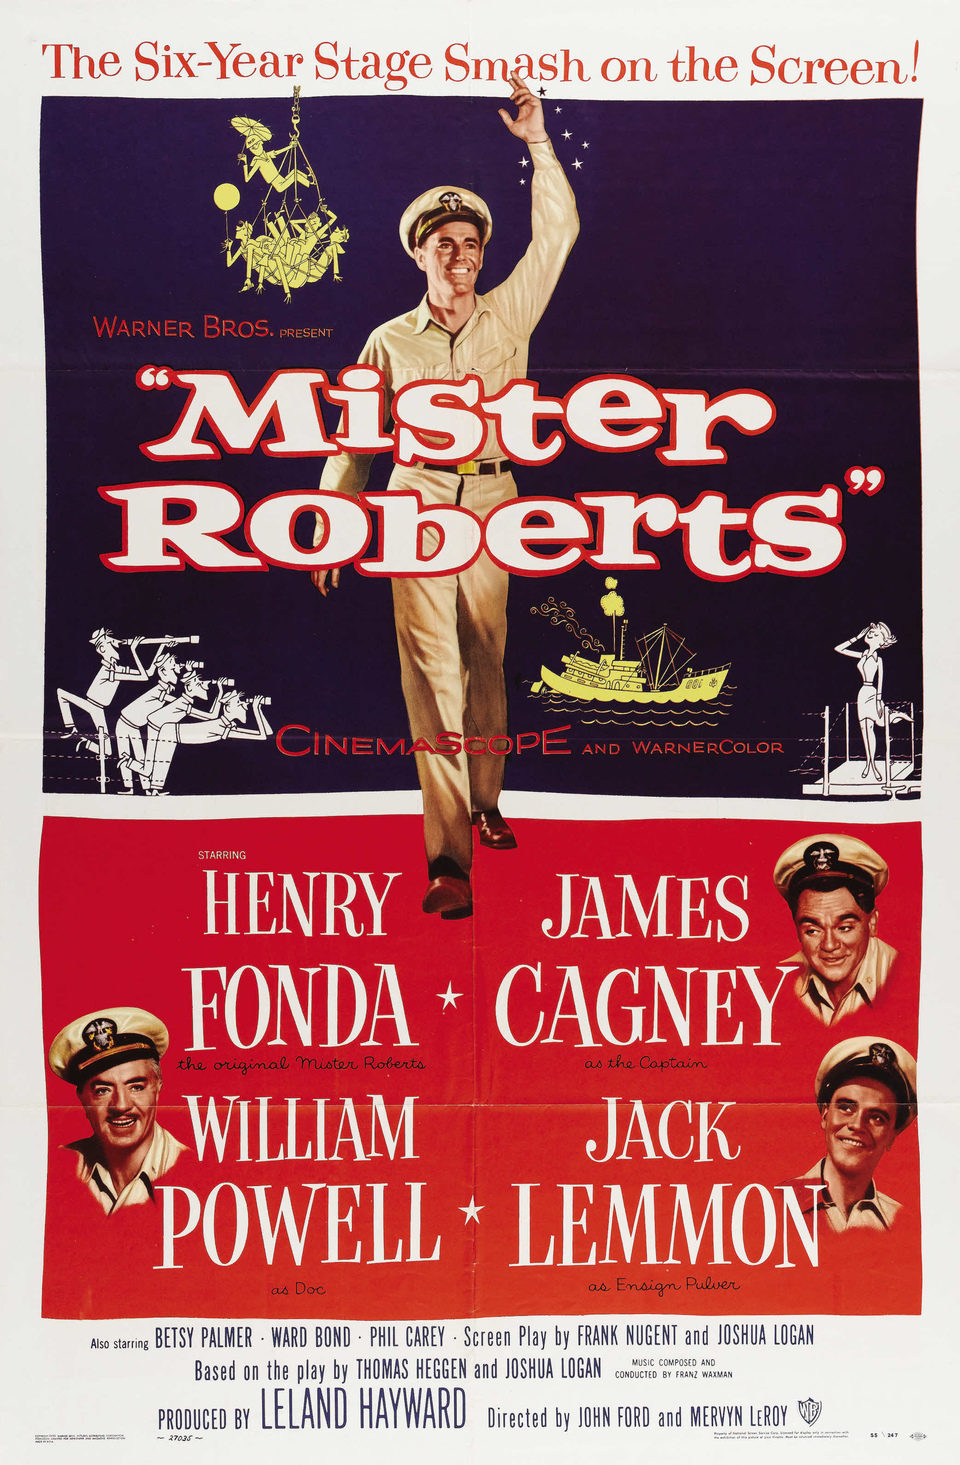 Estados Unidos poster for Mister Roberts